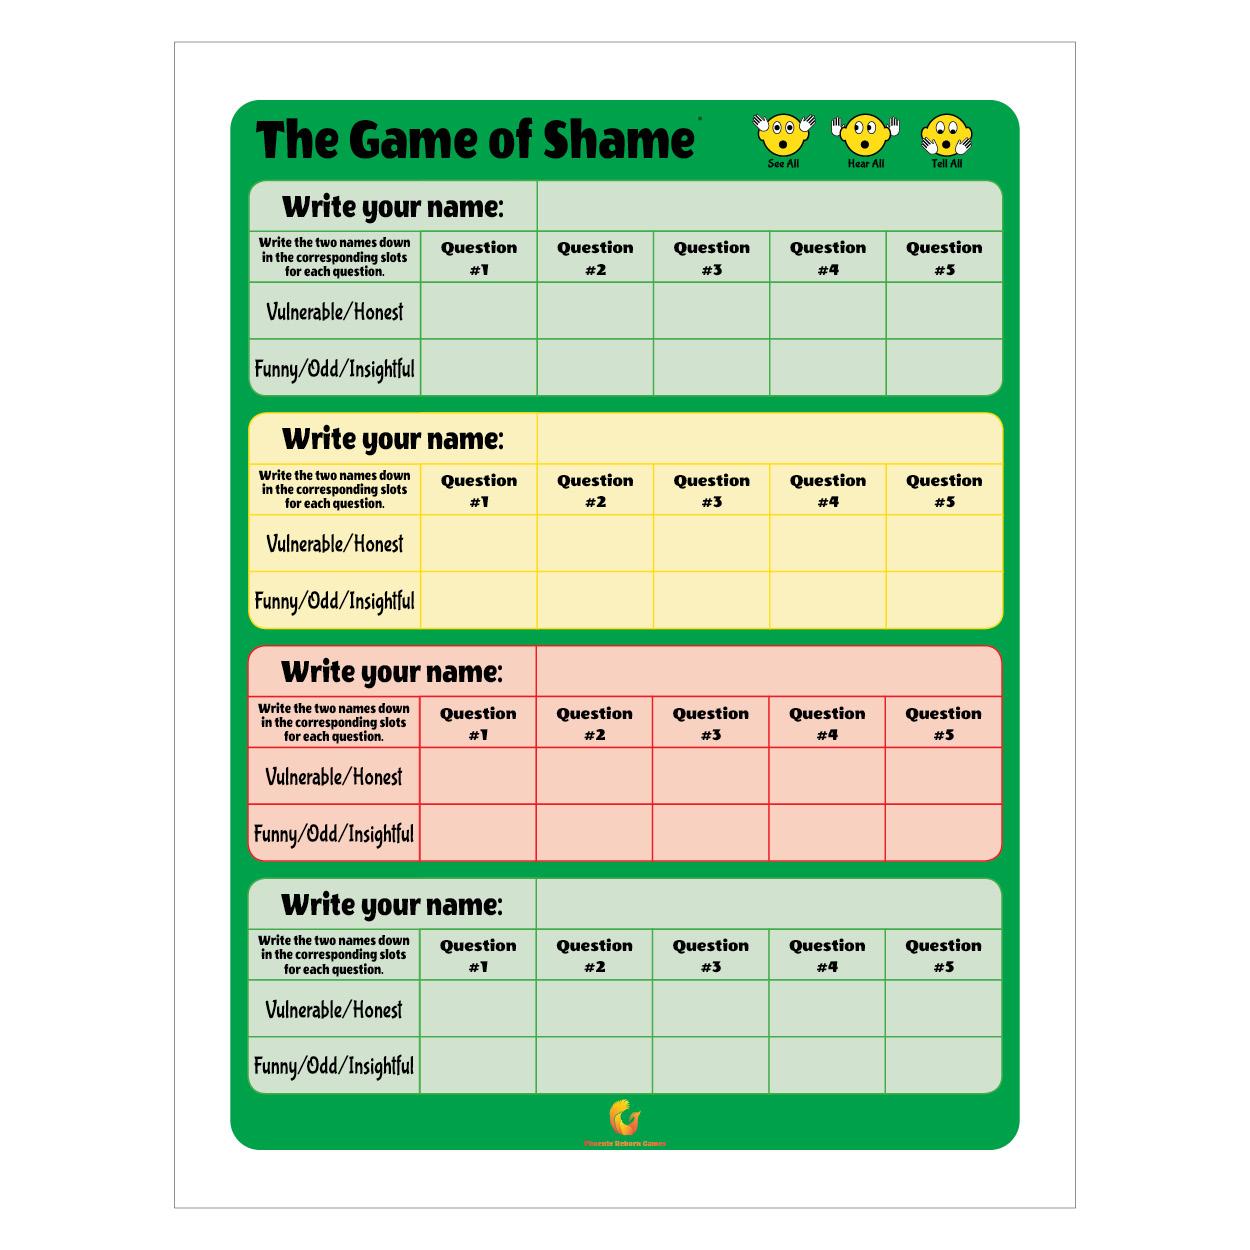 Scoresheet Design - Game of Shame©